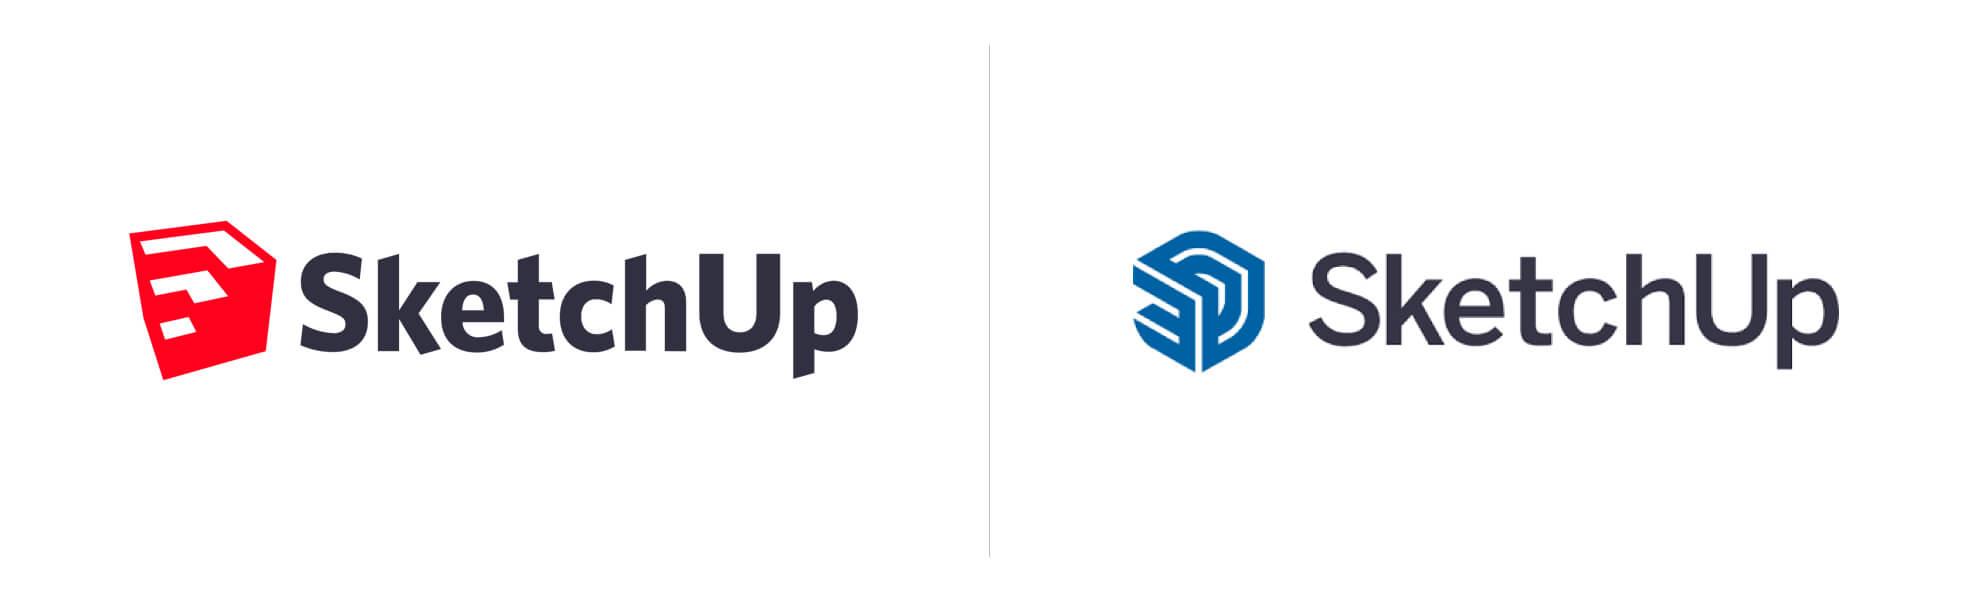 SketchUp znowym logo